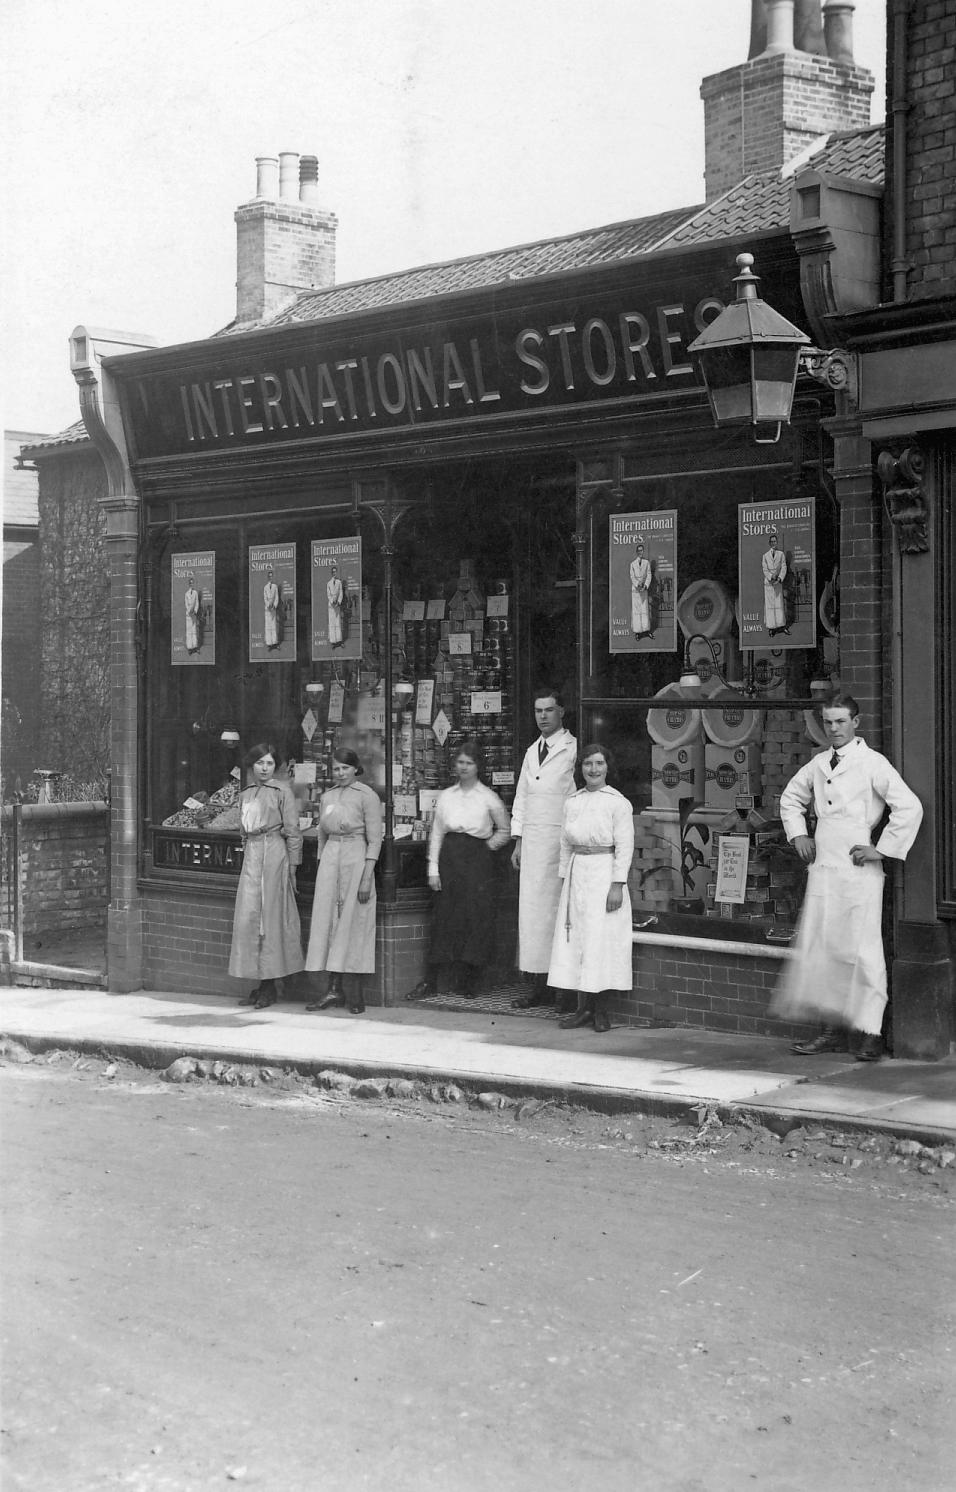 International Stores